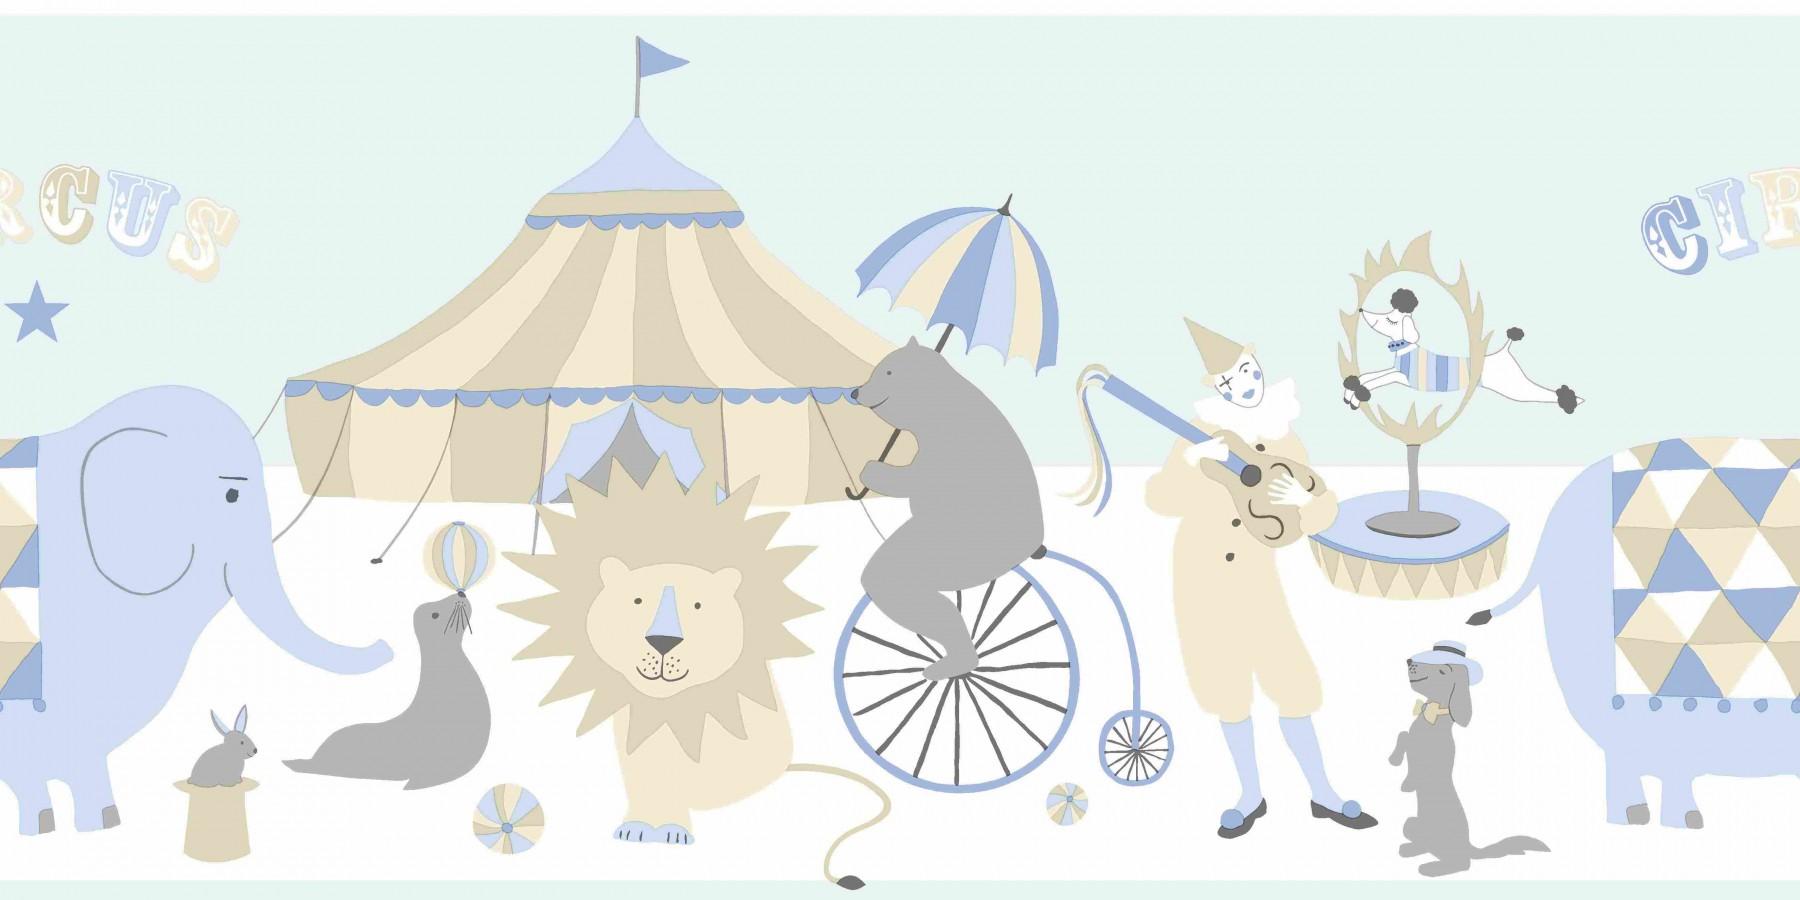 Cenefa para dormitorios infantiles motivos del circo Le Cirque 7363